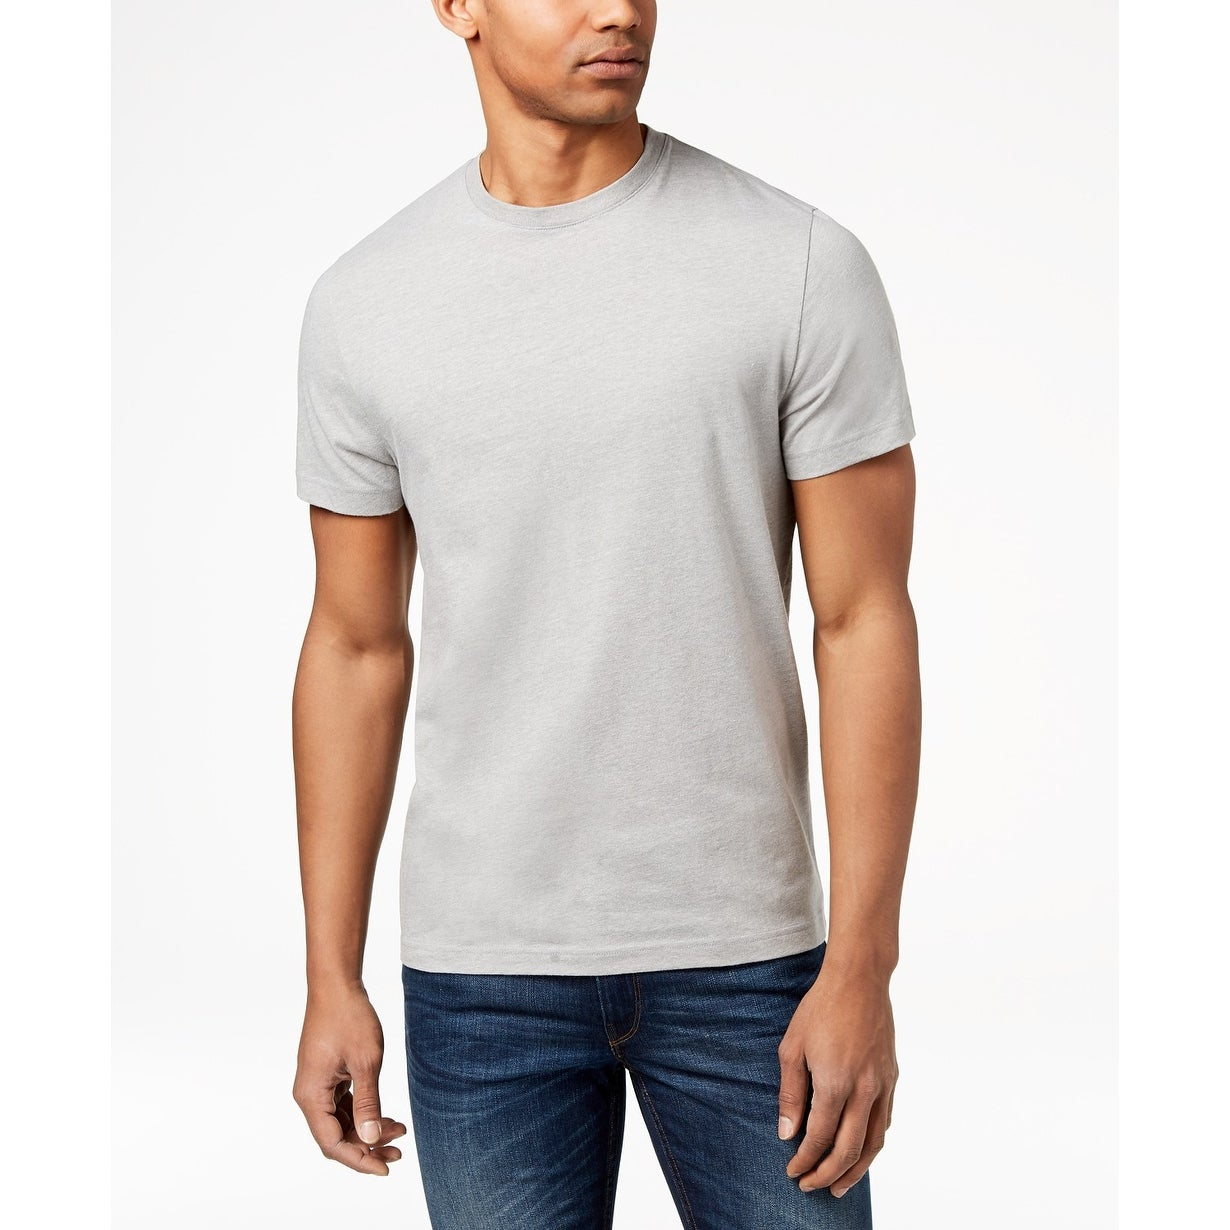 281f4048 Hanes Mens Slim Fit Short Sleeve Plain T Shirt – EDGE Engineering ...